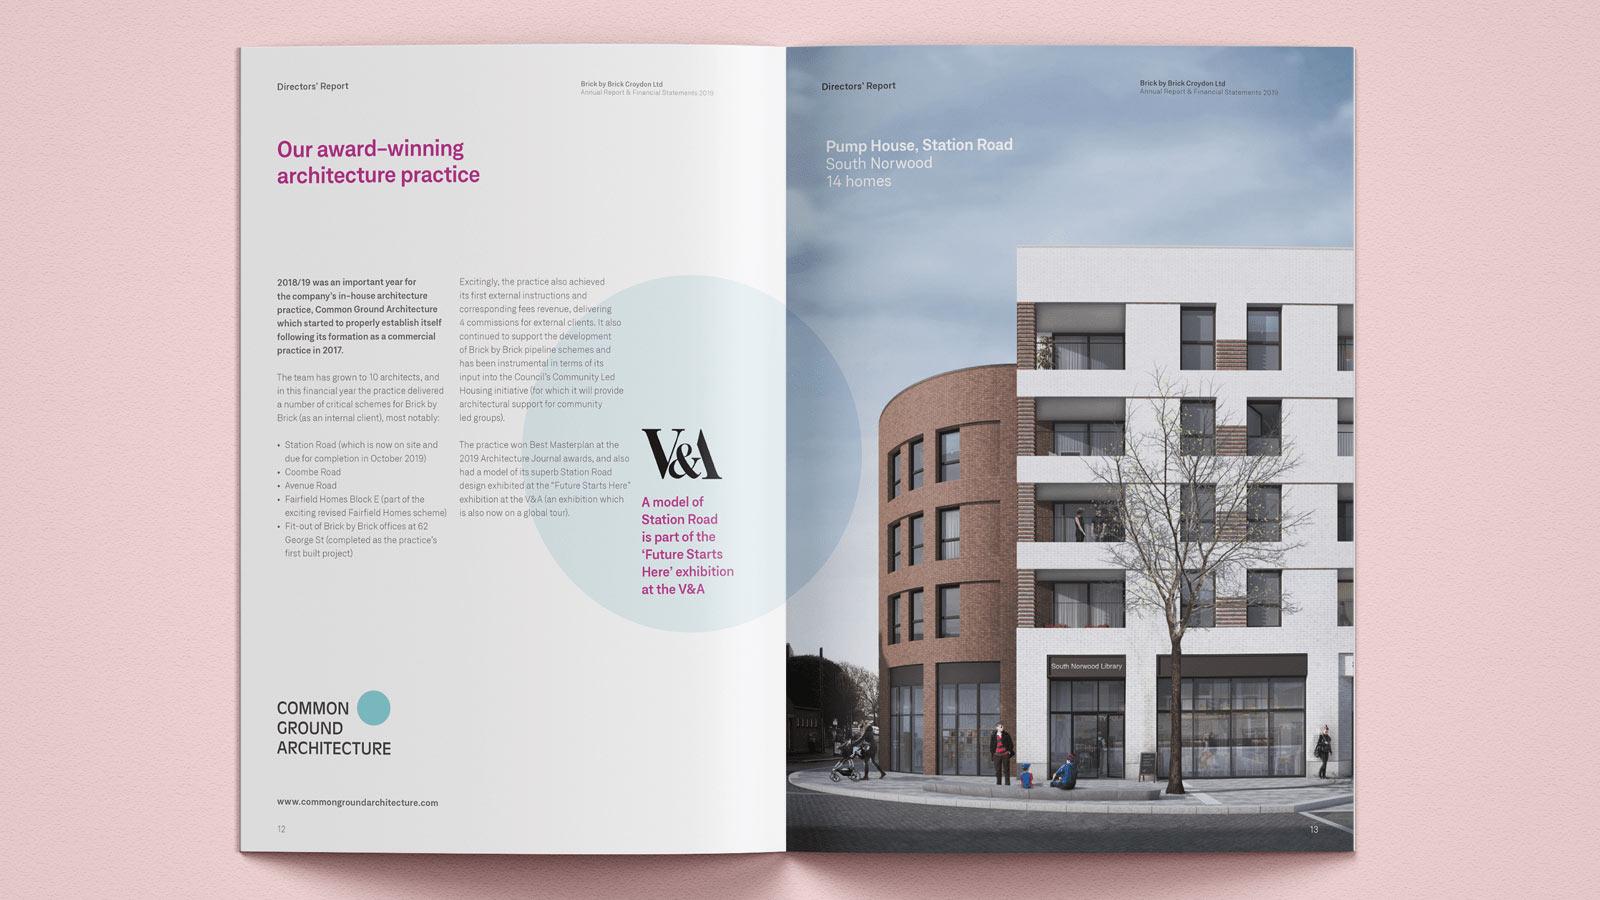 annual-report-financial-review-design-brochure-artwork-layout-milton-keynes-london-4